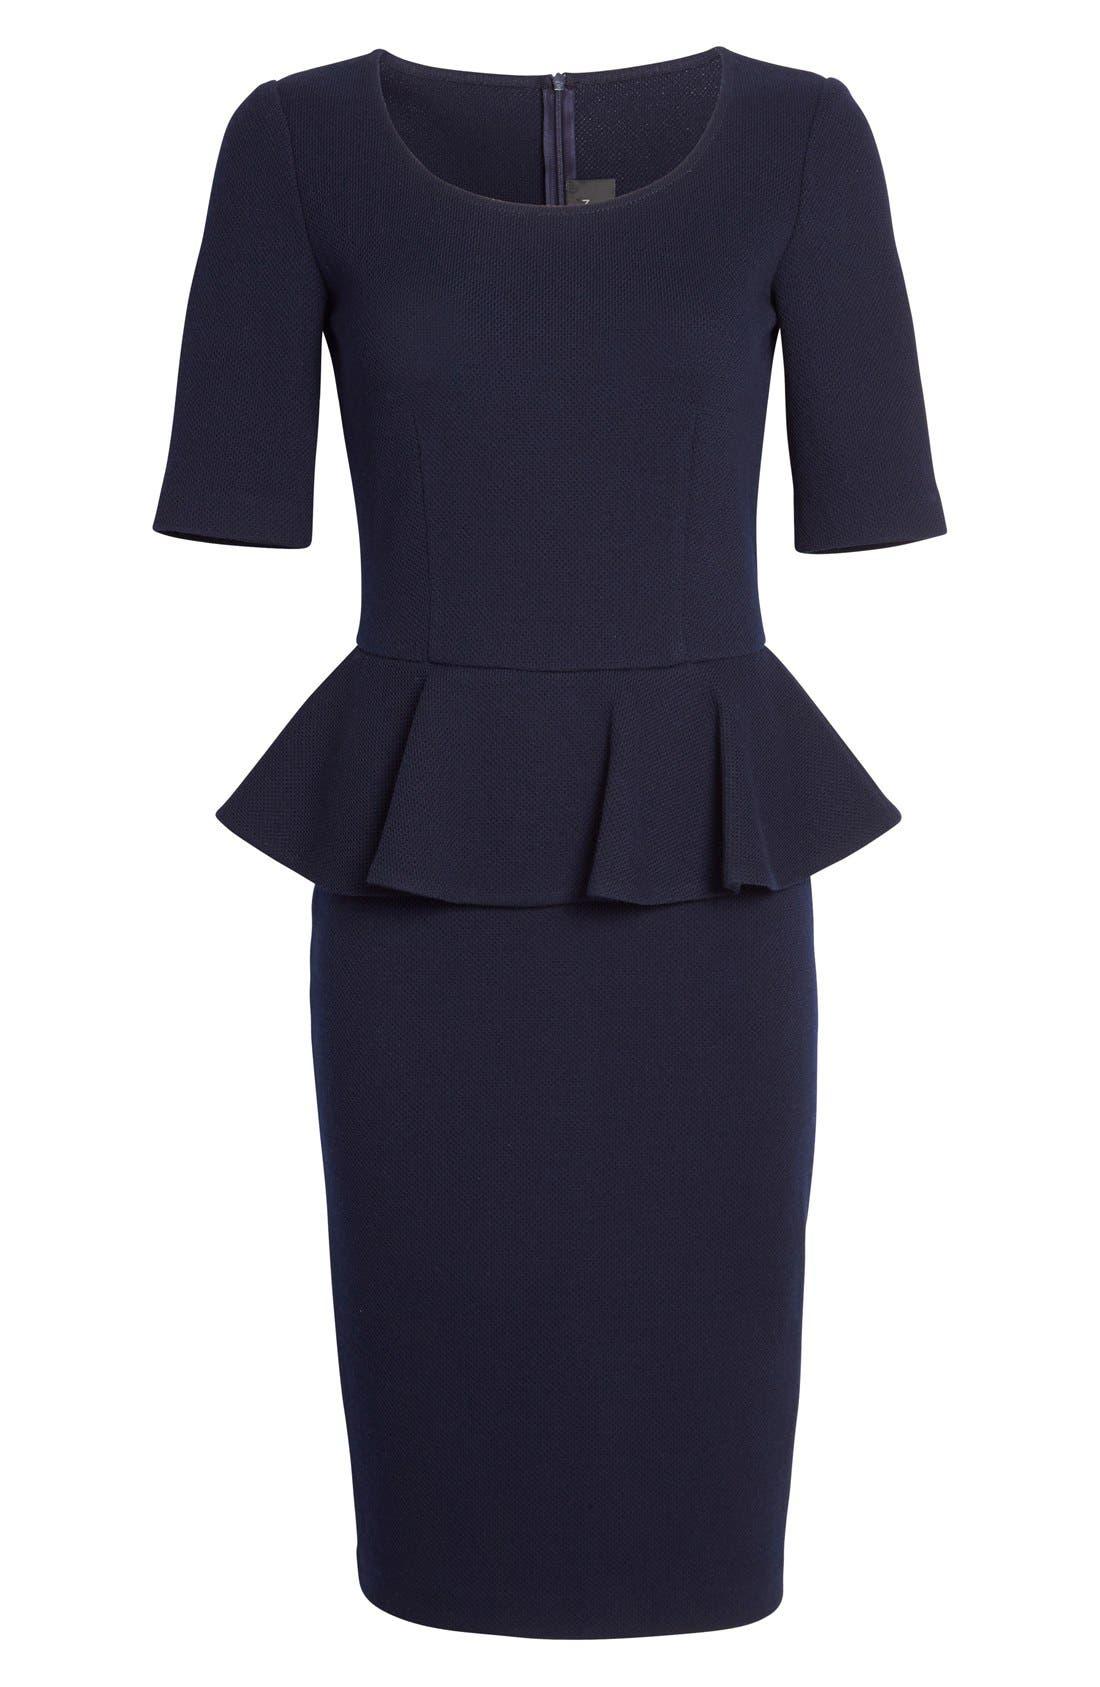 Alternate Image 4  - St. John Collection Peplum Milano Piqué Knit Dress